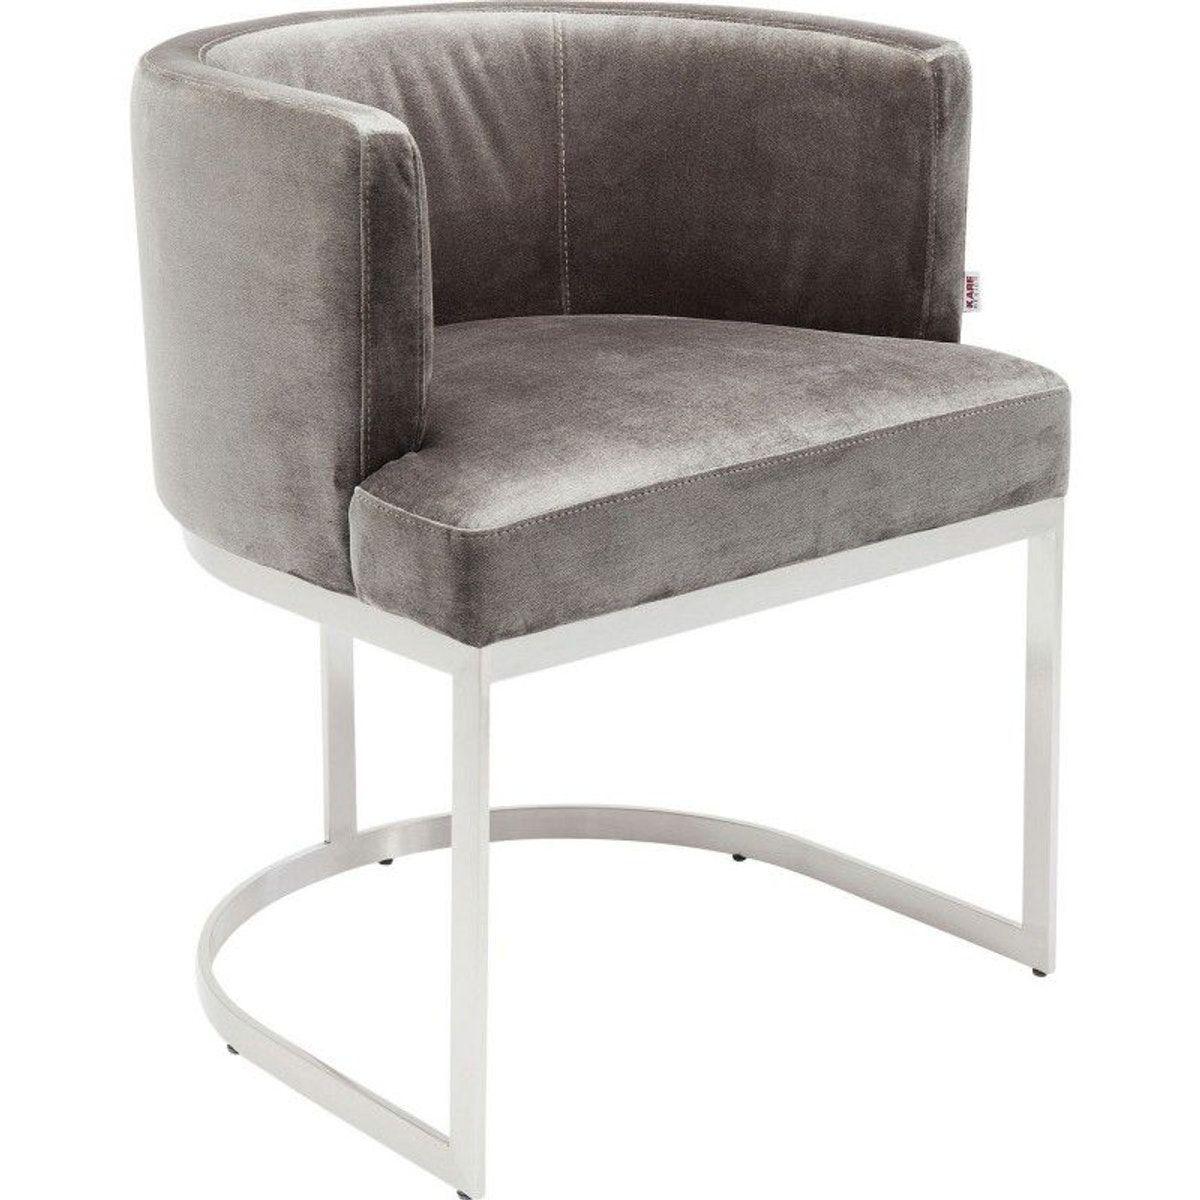 avec Kare accoudoirs en 2019 grise Design Chaise Rumba LUzpMVqSjG